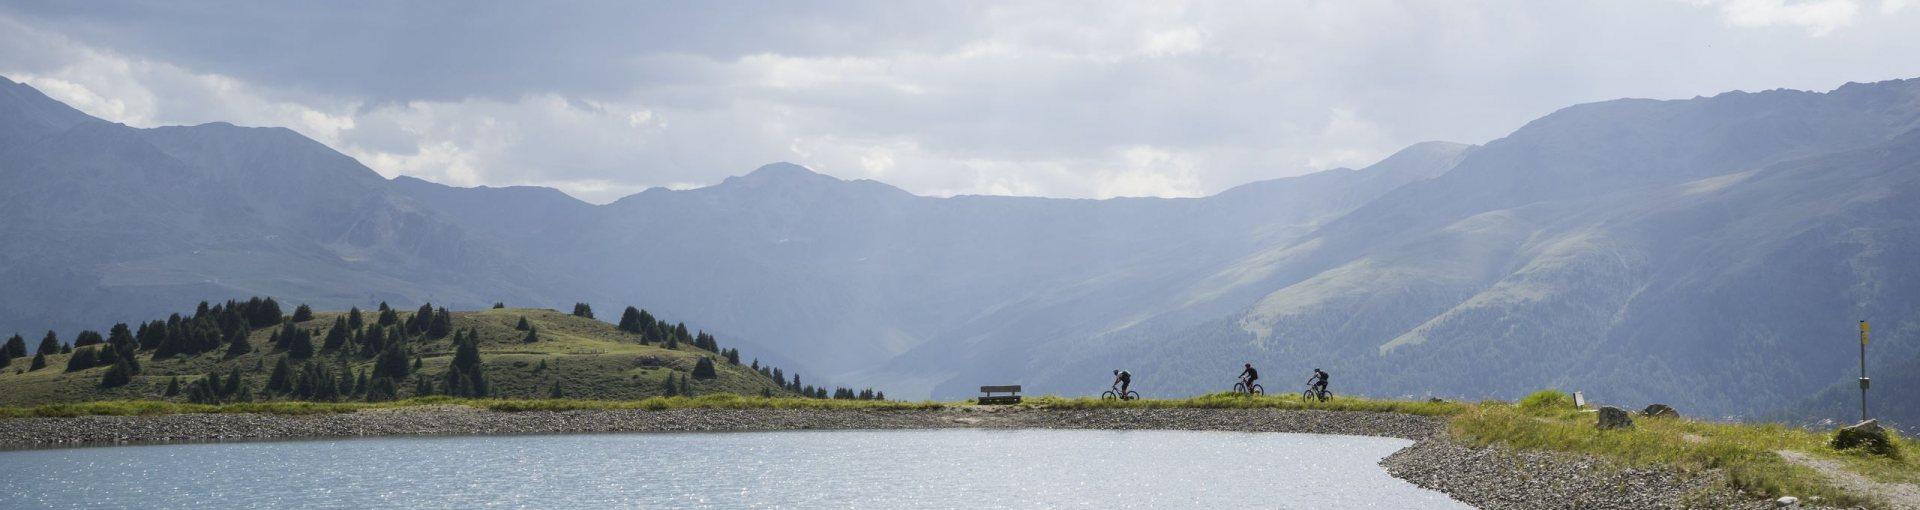 Great Trails © Nauders Tirol Werbung